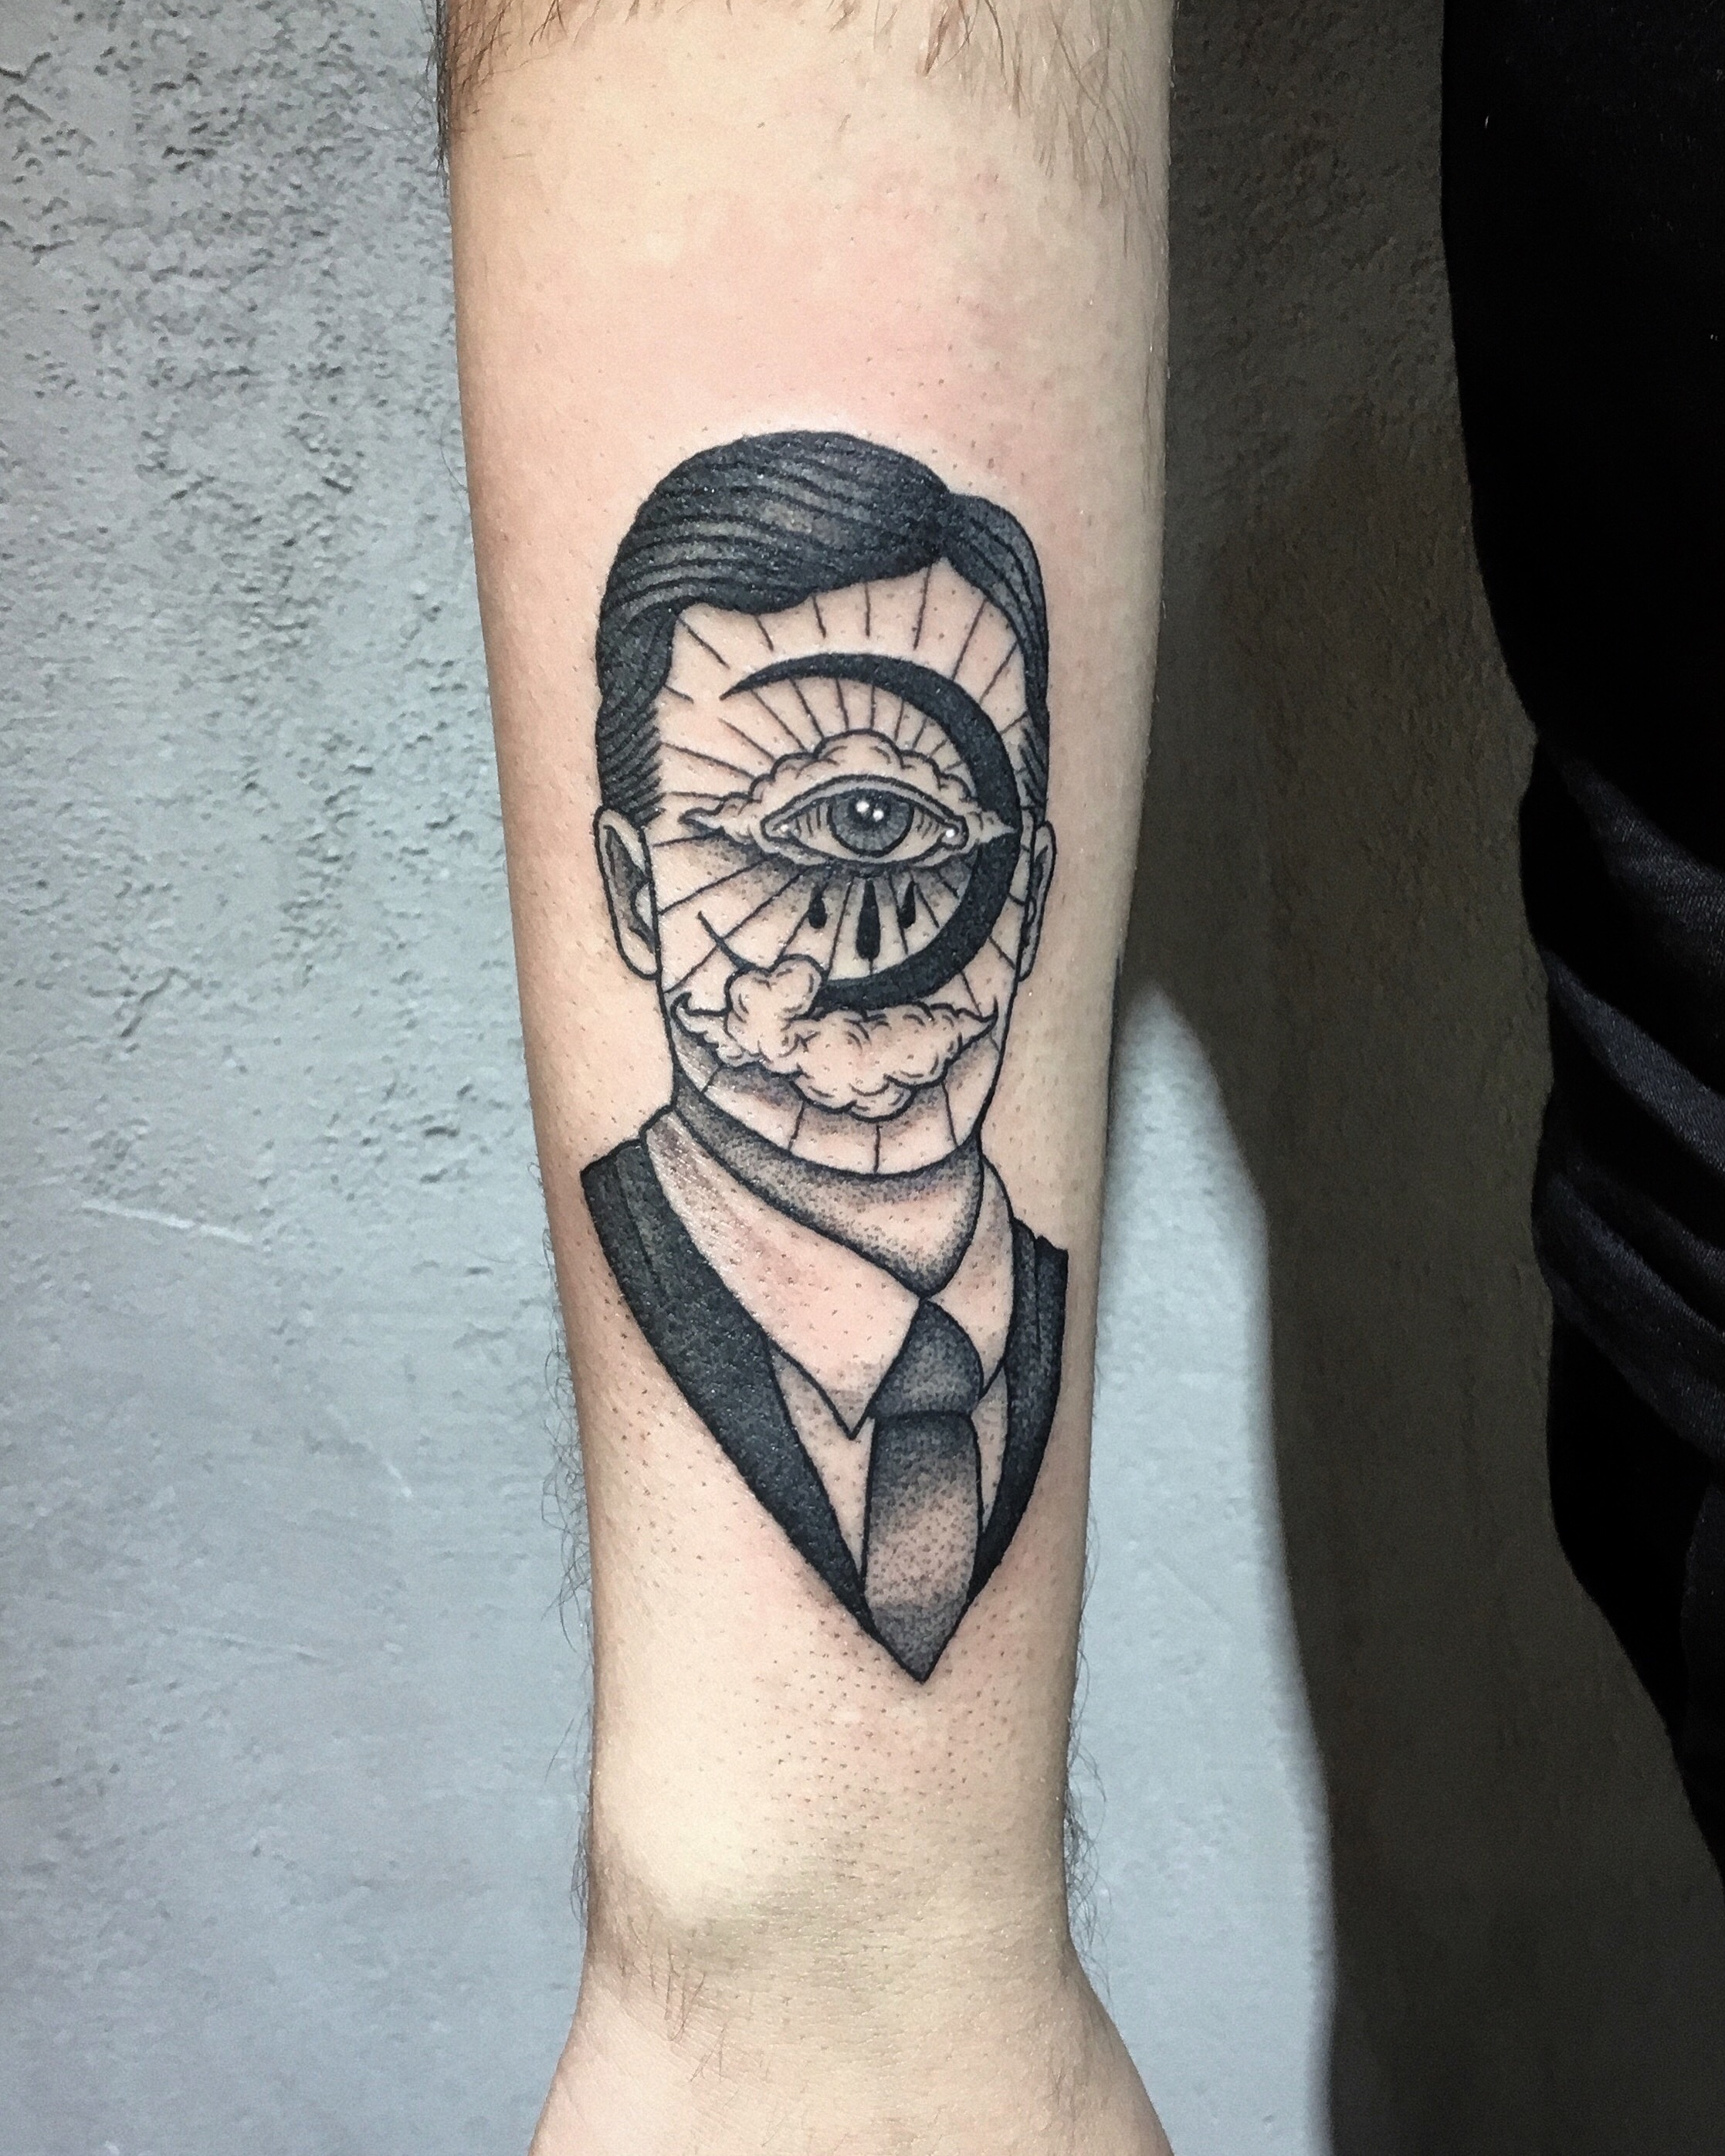 Inksearch tattoo Projectblackwork